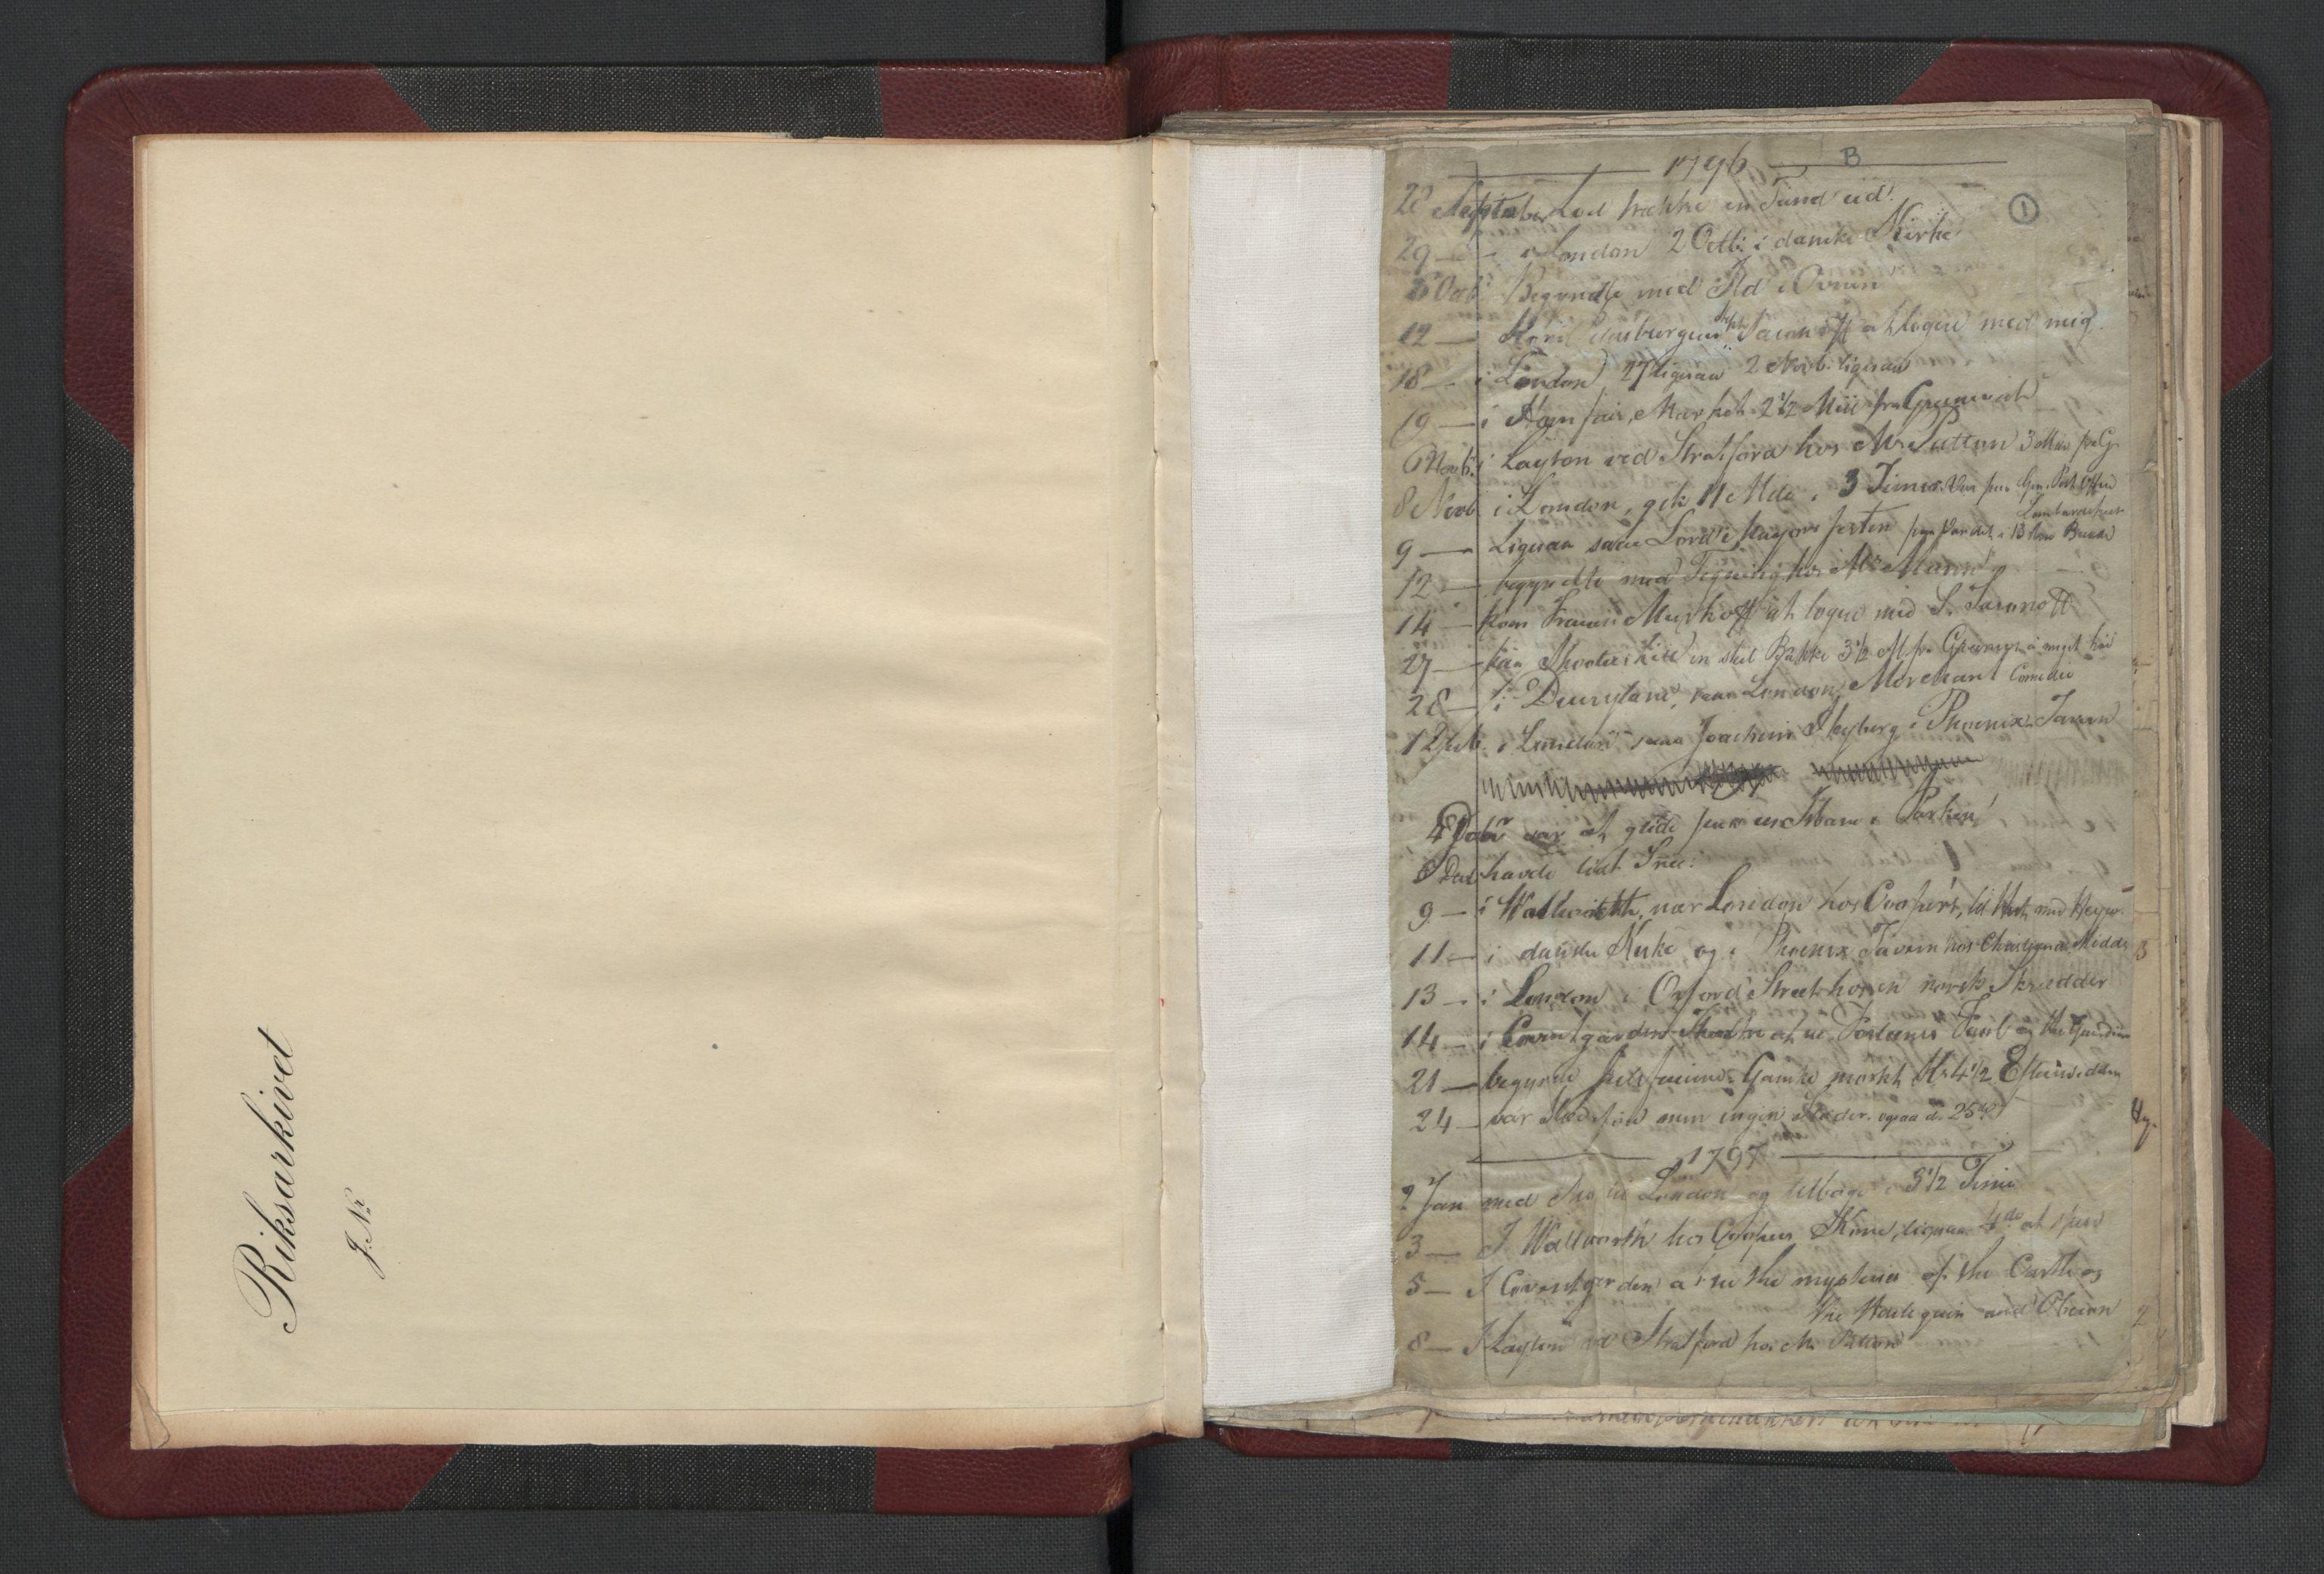 RA, Meltzer, Fredrik, F/L0002: Dagbok, 1796-1808, s. 1a